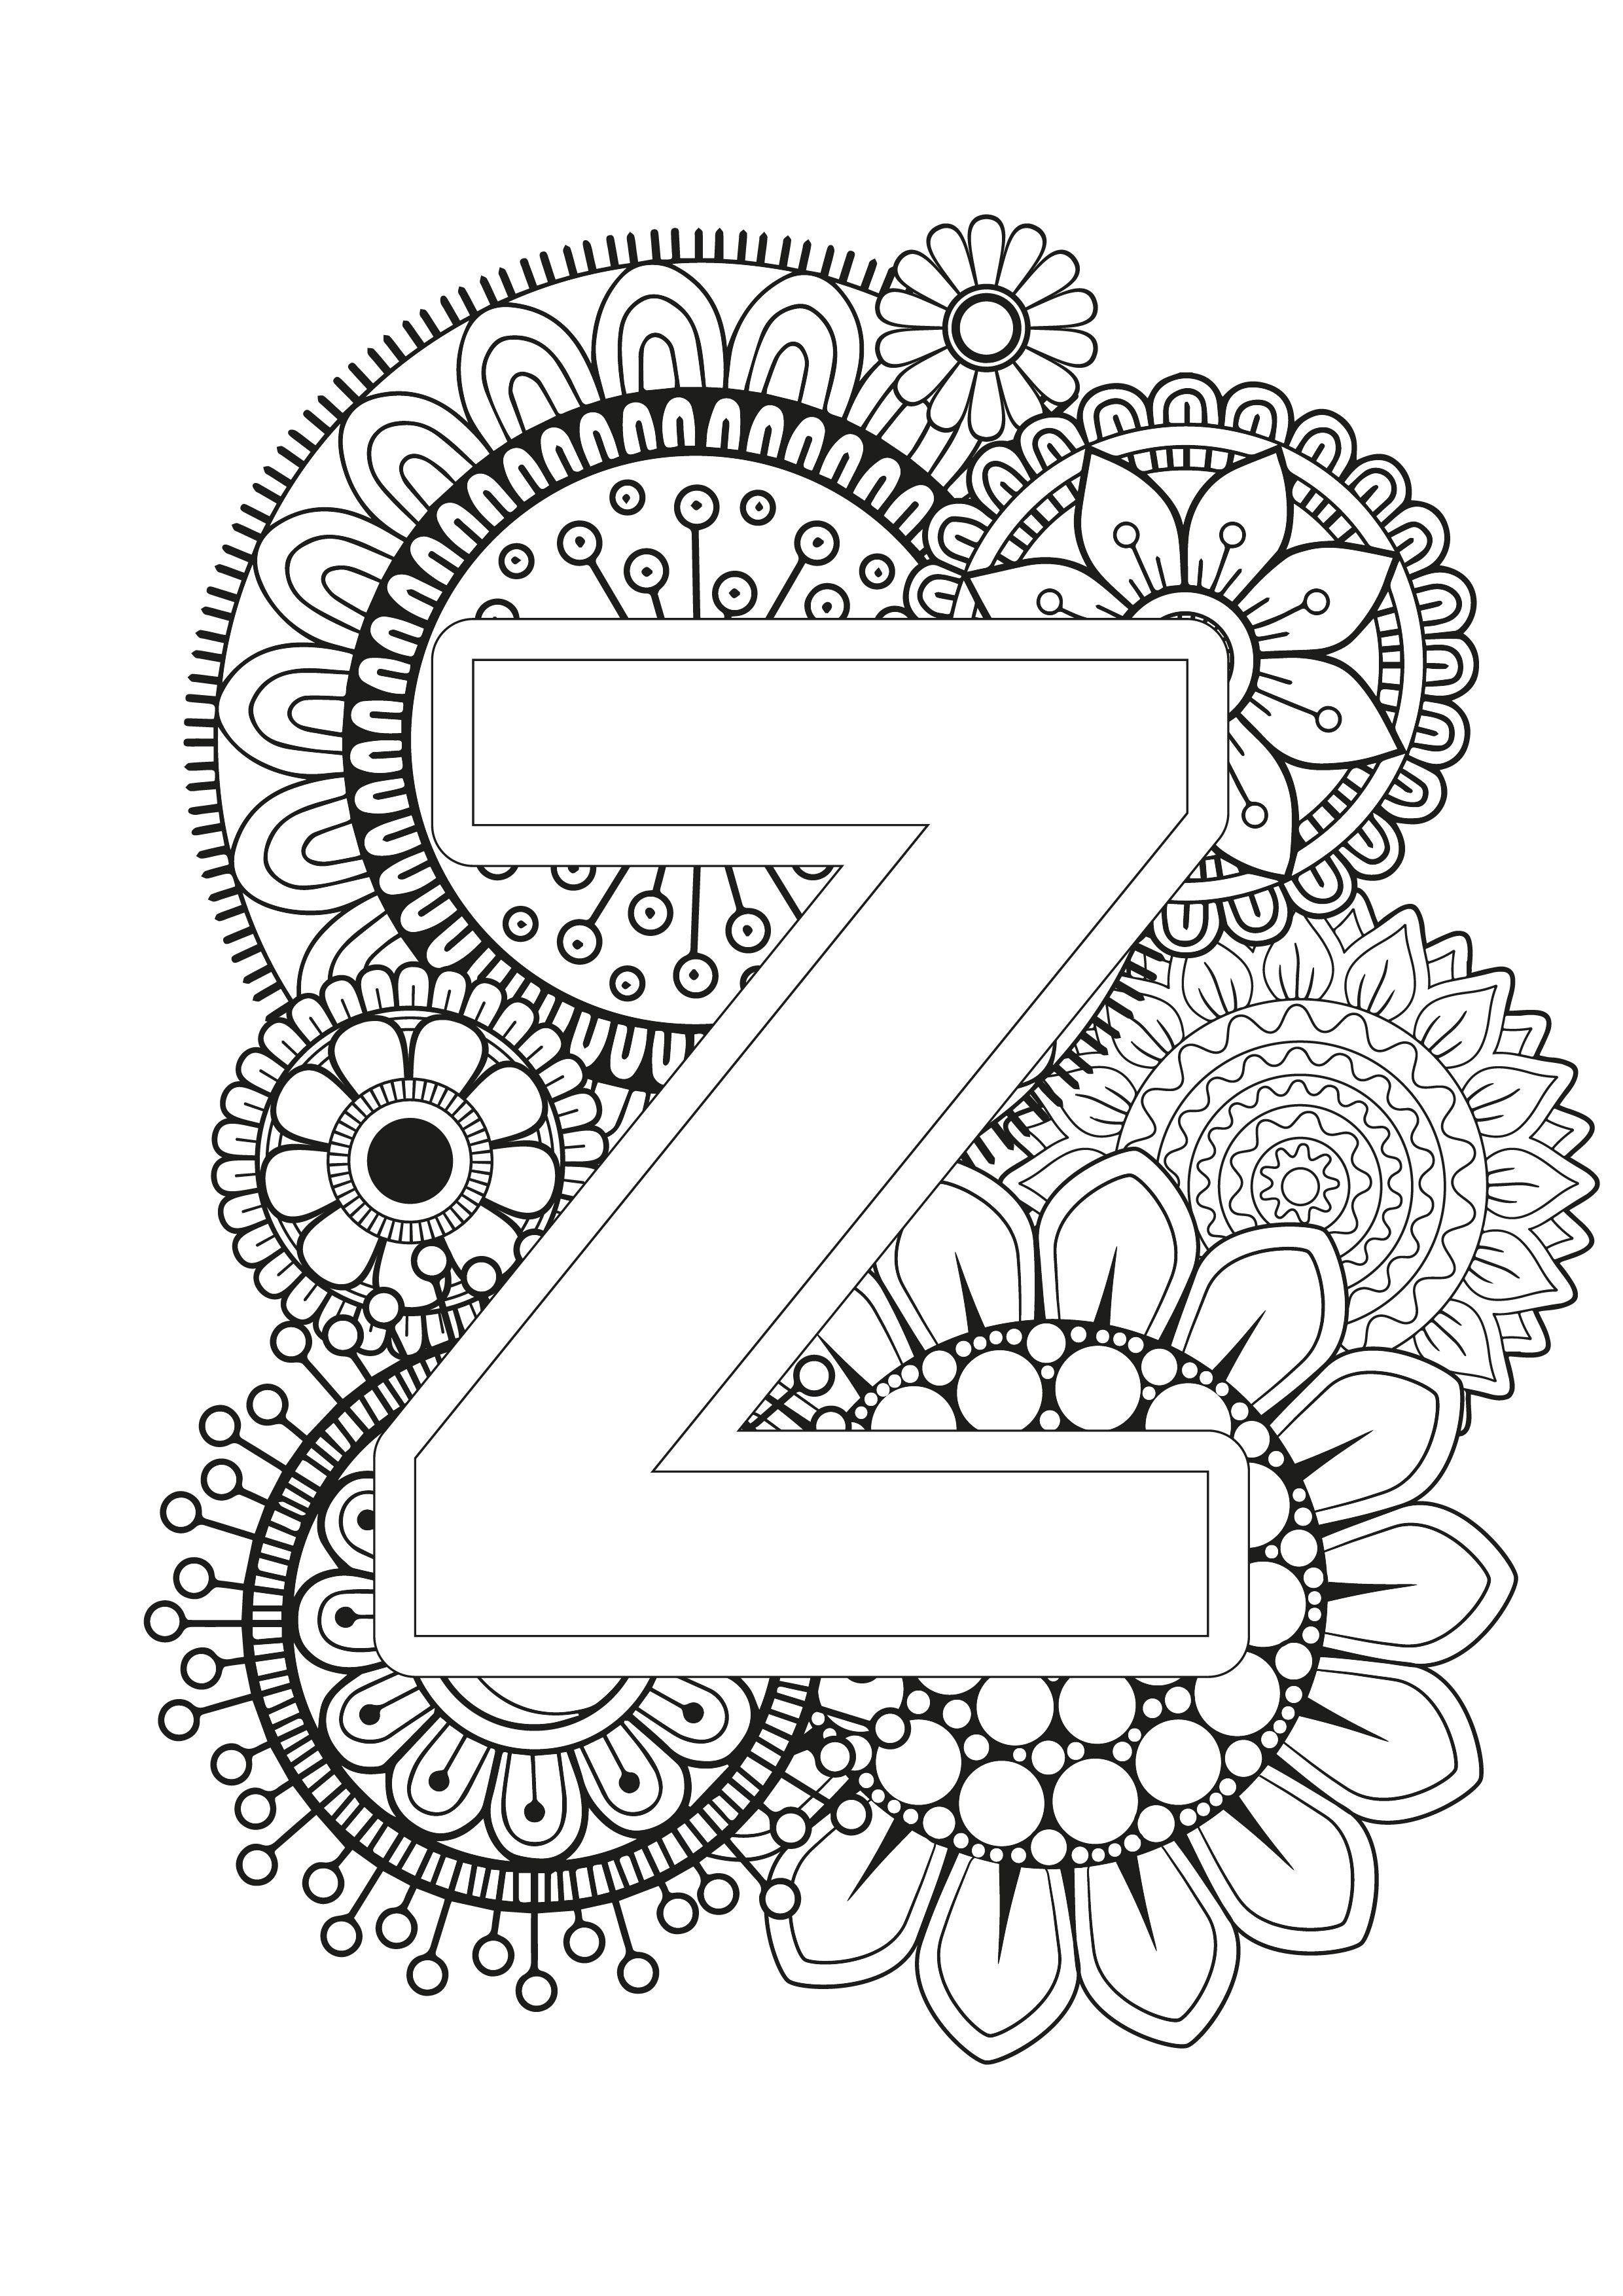 Mindfulness Coloring Page Alphabet Alphabet Coloring Pages Designs Coloring Books Coloring Pages